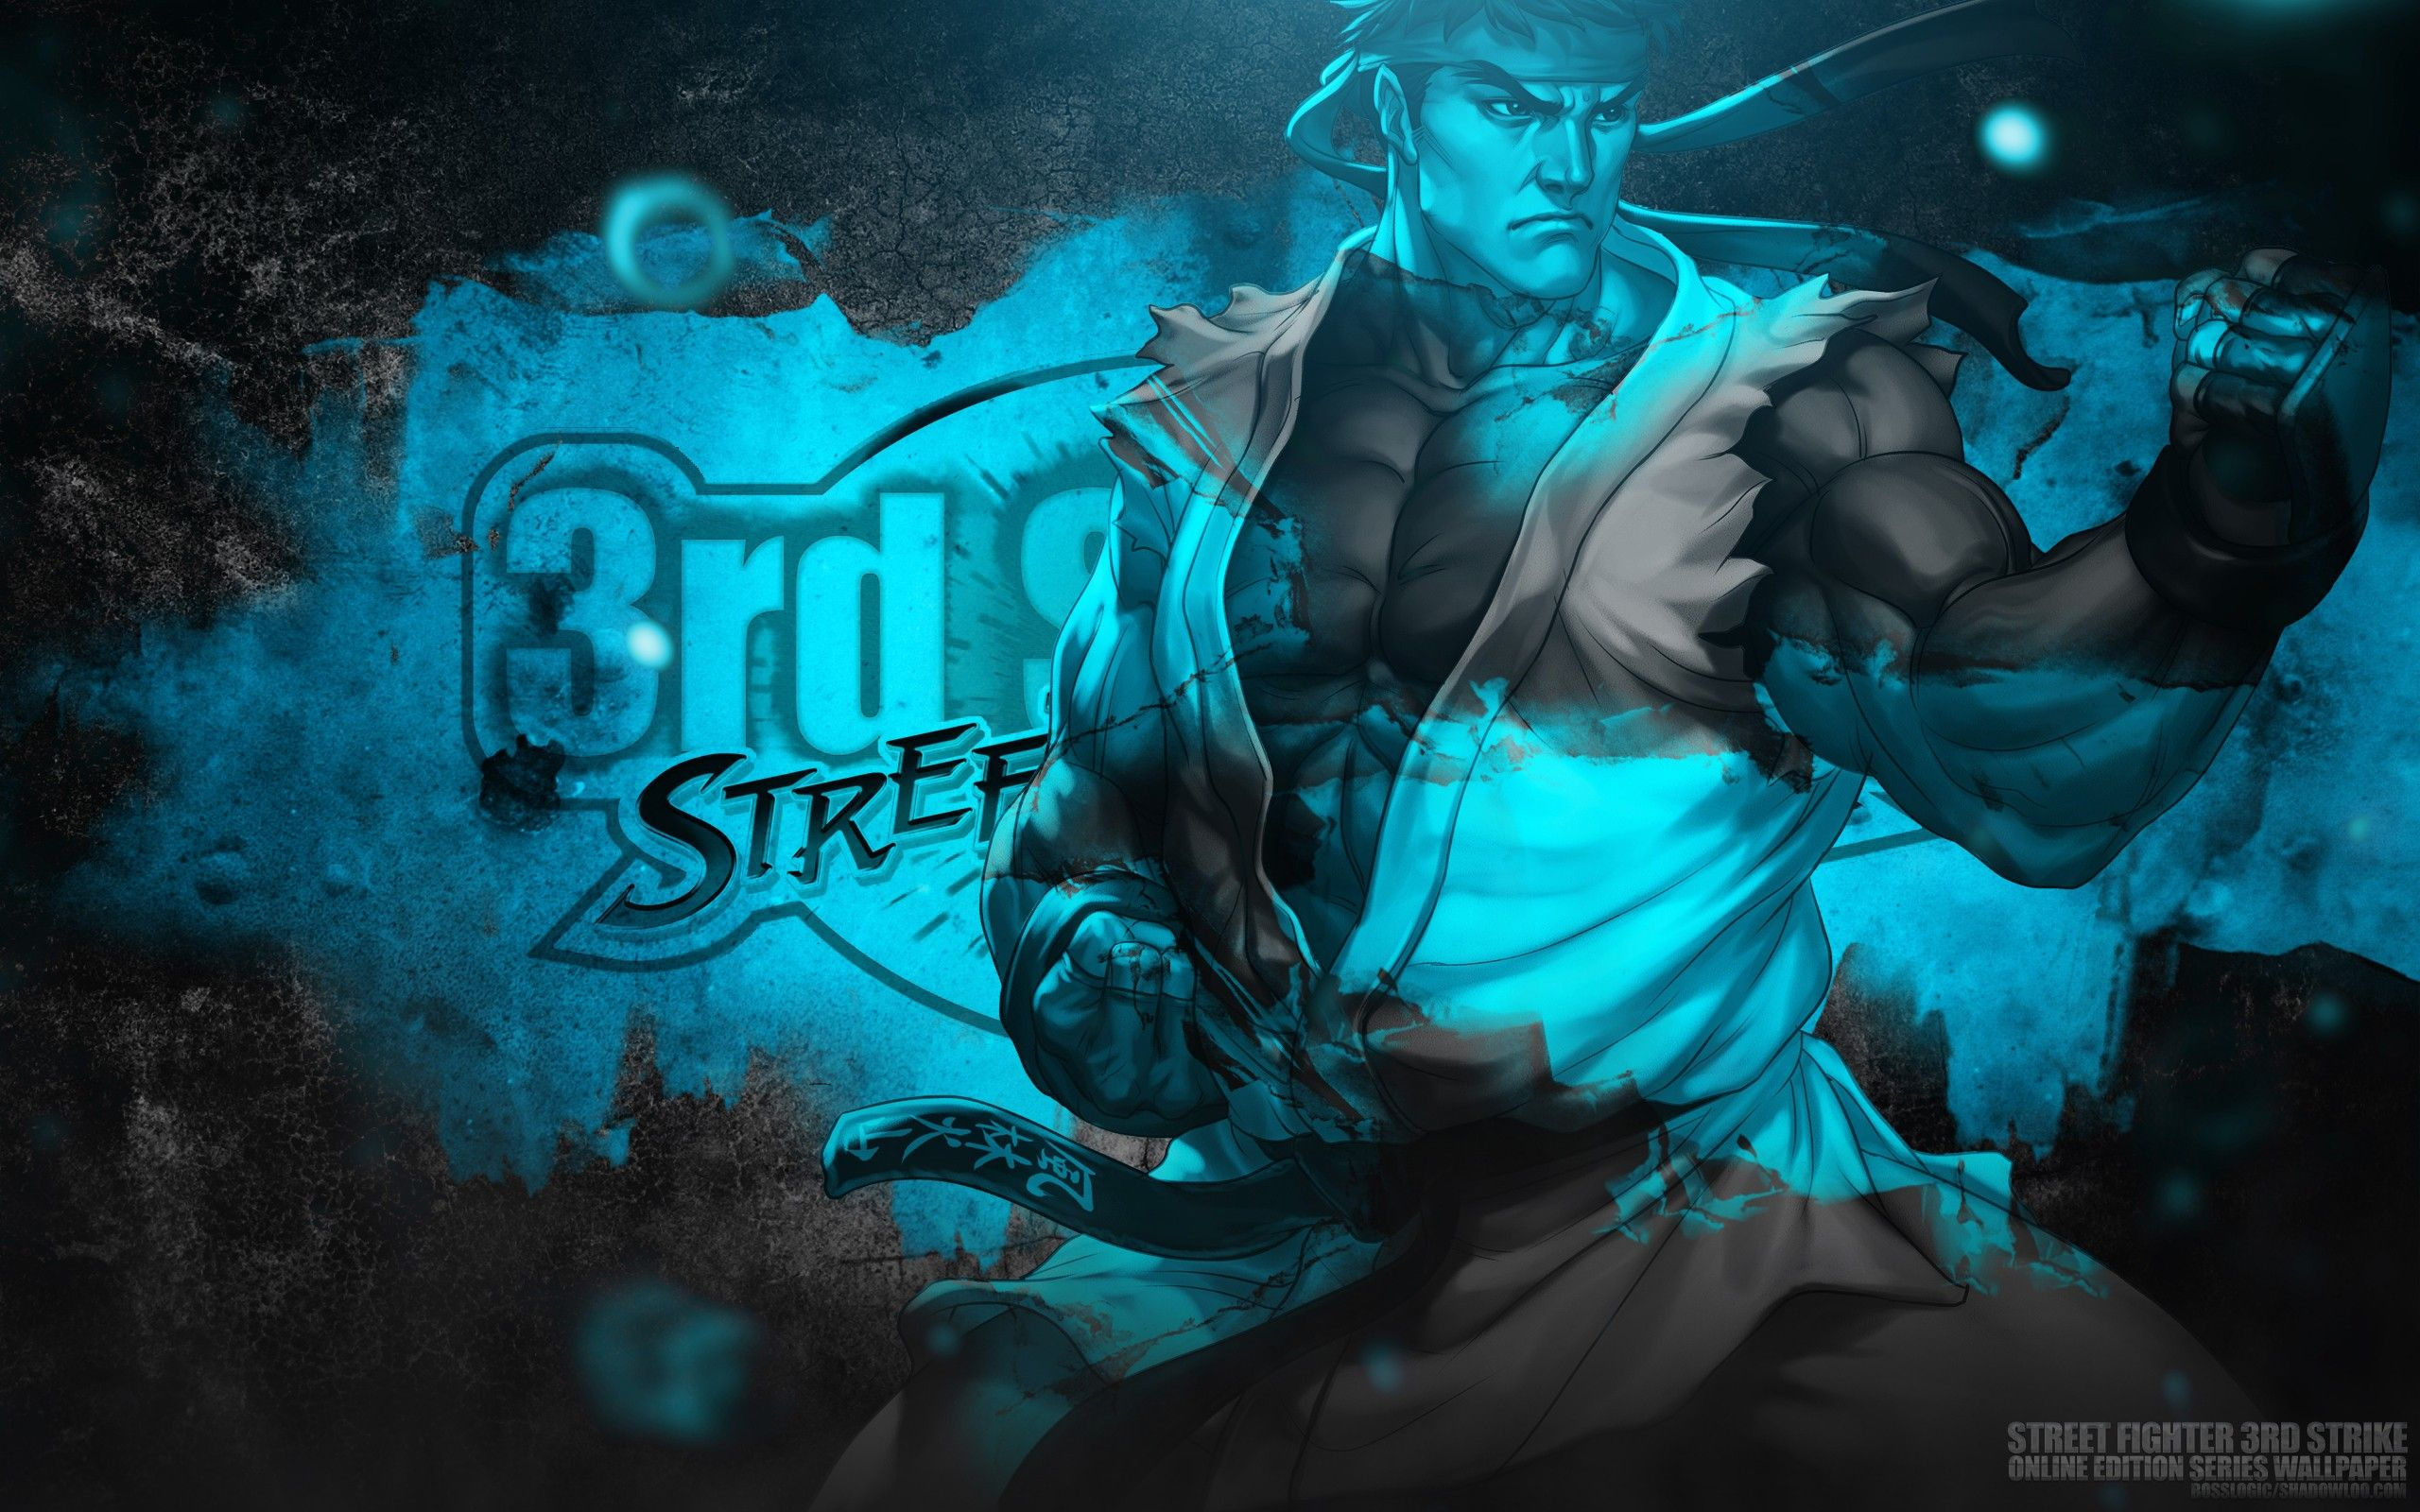 Street Fighter 3rd Strike Wallpaper